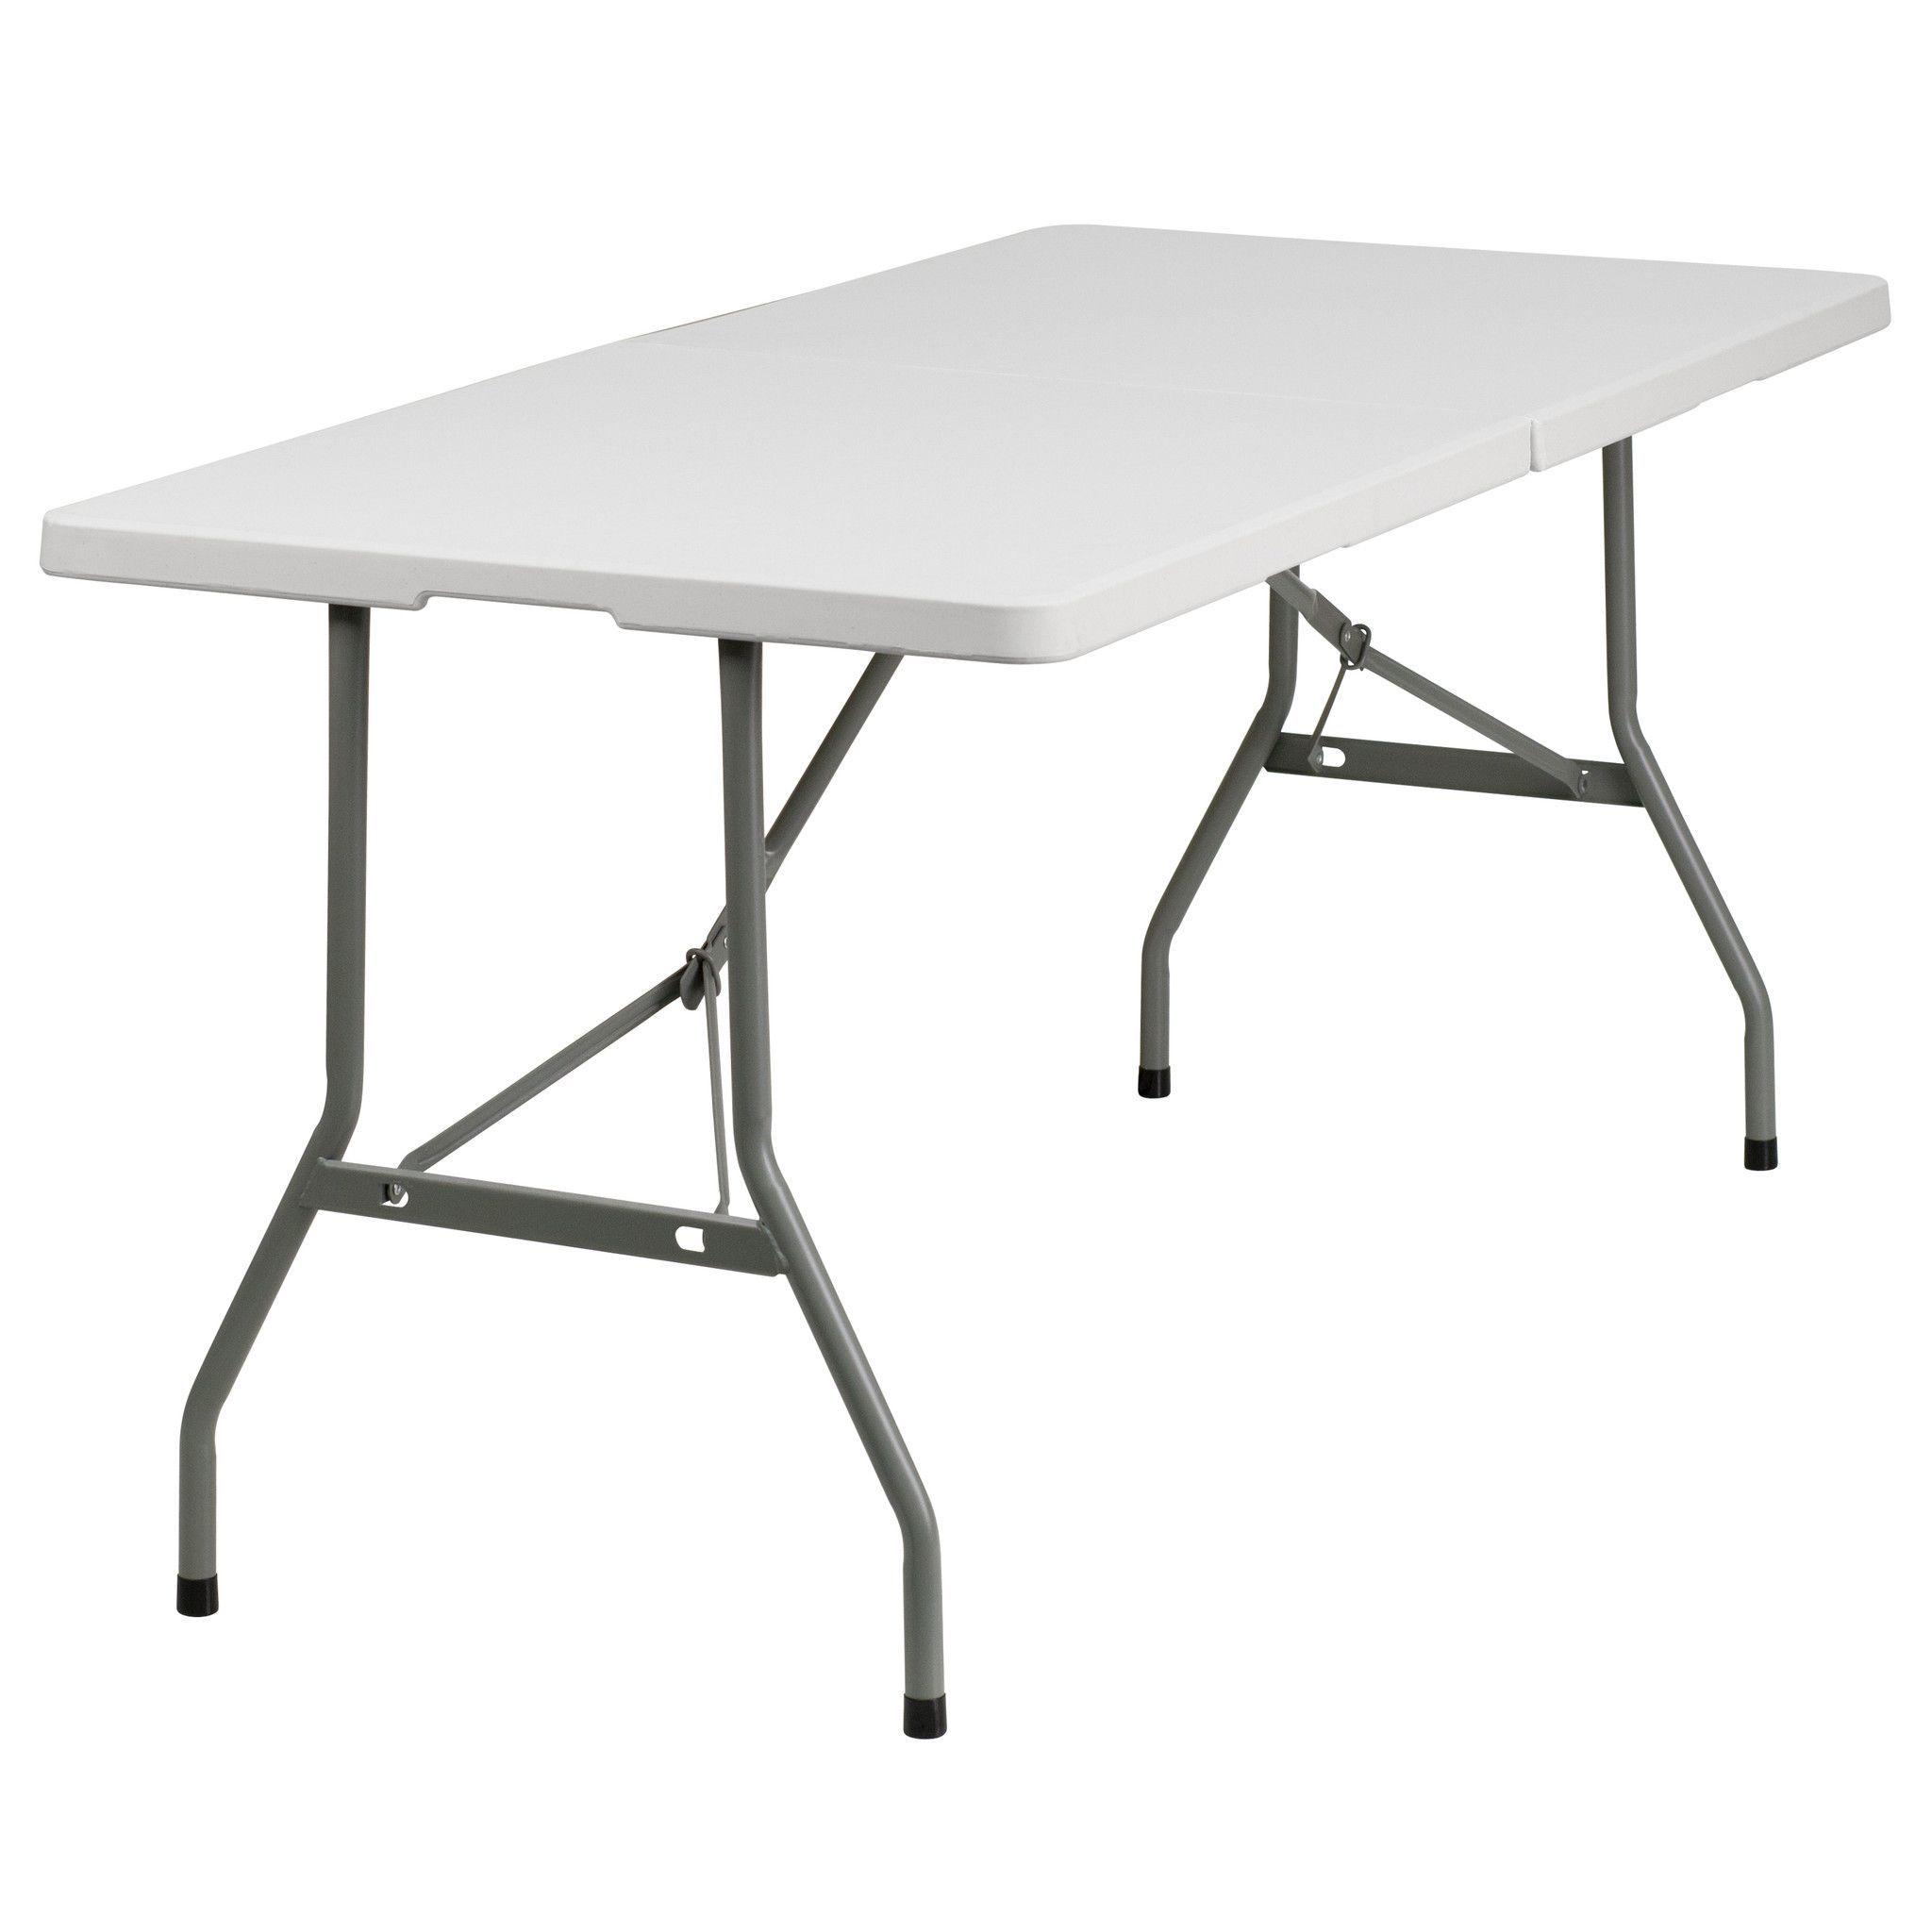 Office folding tables buy uuw x uul plastic bifolding table at harvey u haley for